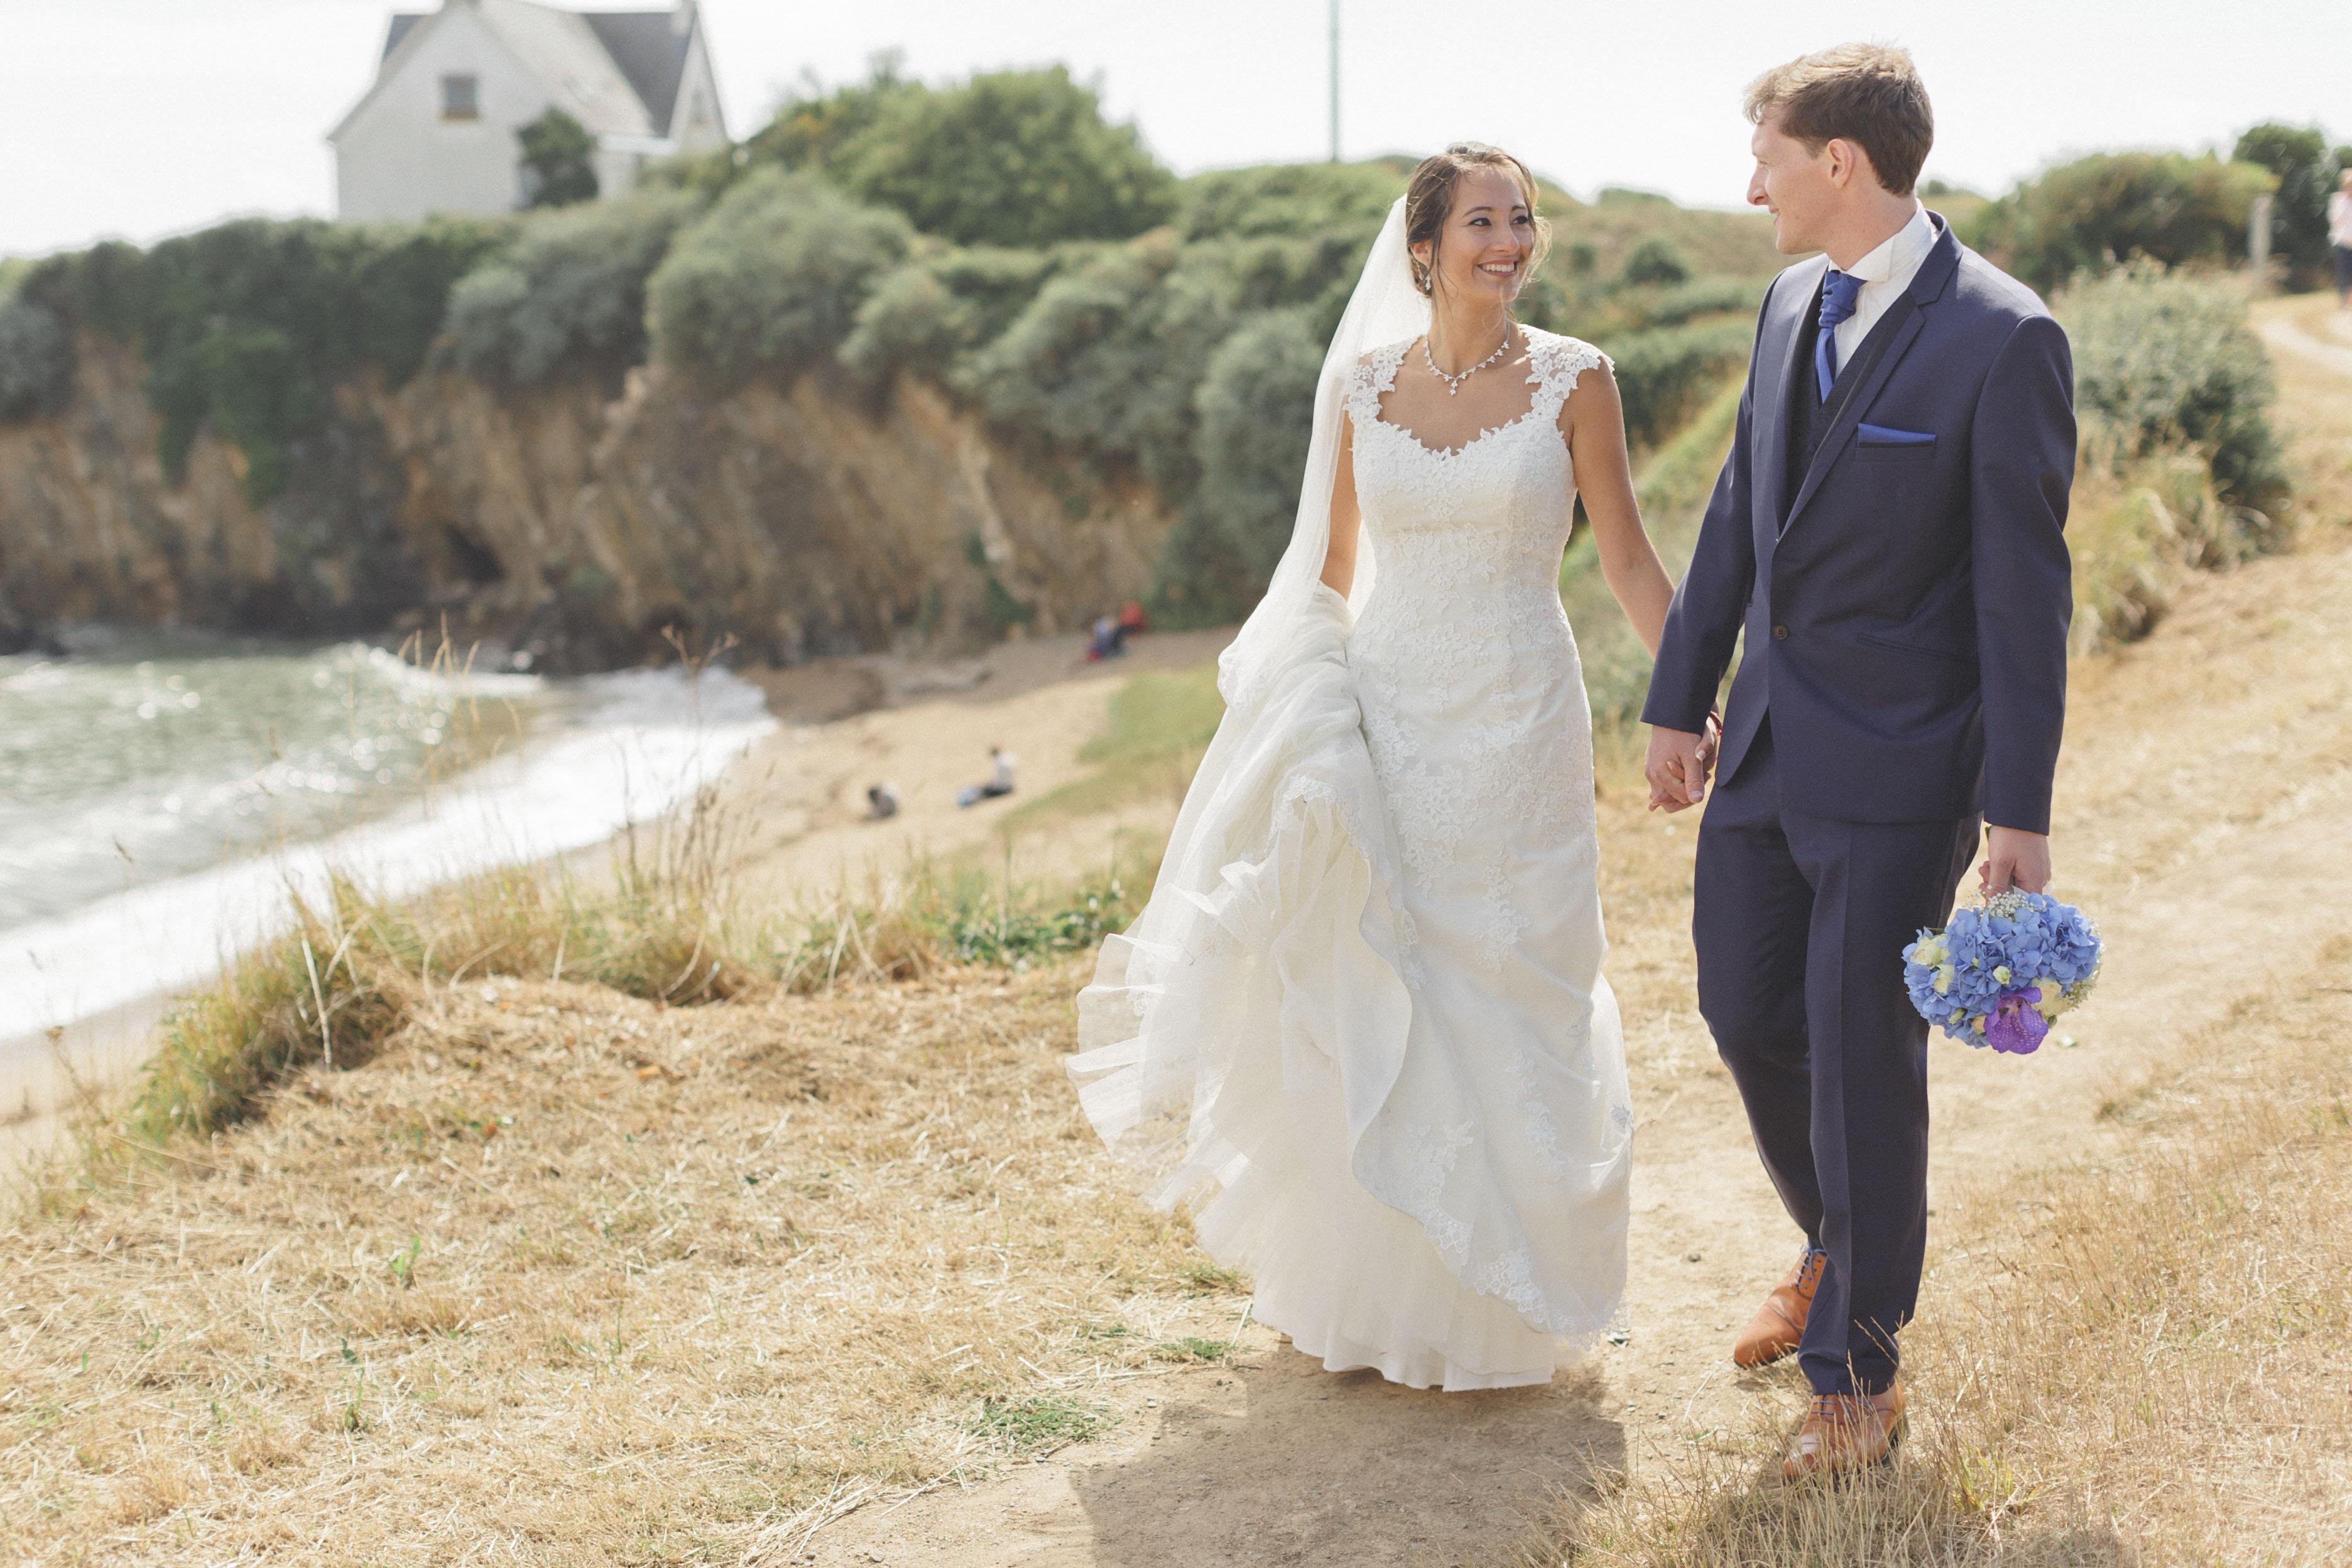 Photographie - Mariage - Bretagne - Finistere - Morbihan - Lilian Vezin Photographie (33)